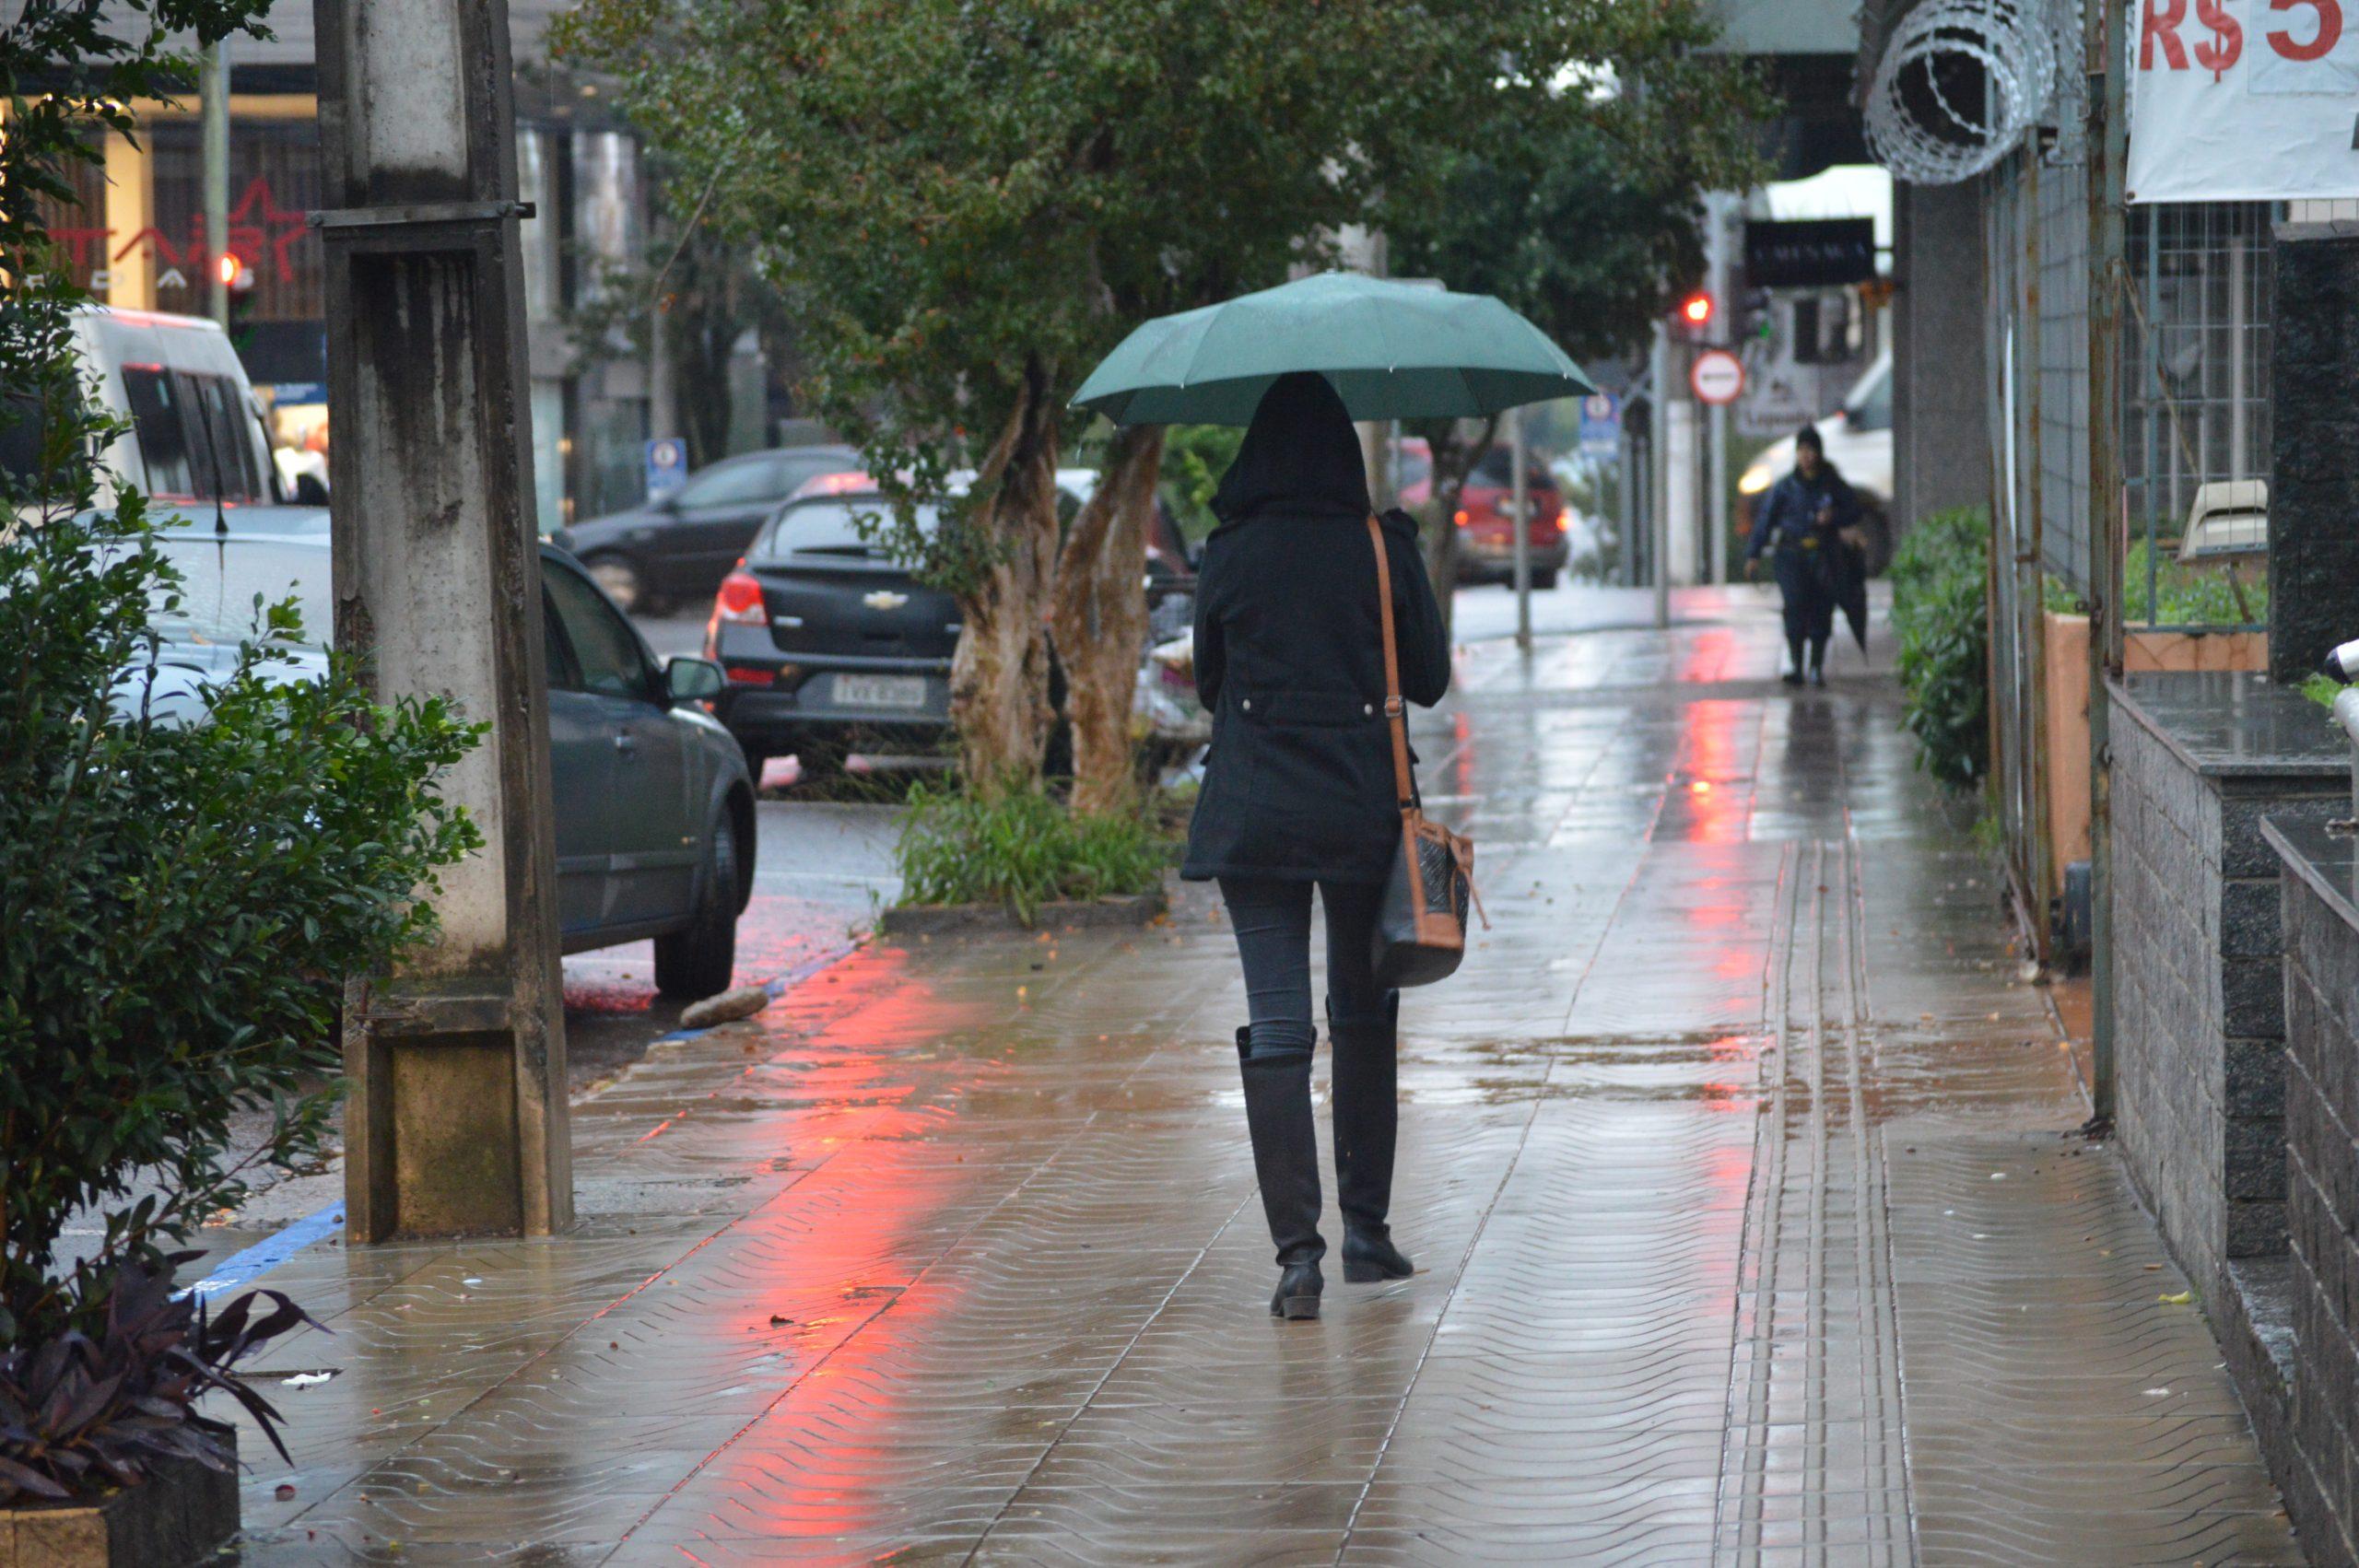 Metsul alerta para chuva forte e vento intenso nesta terça-feira